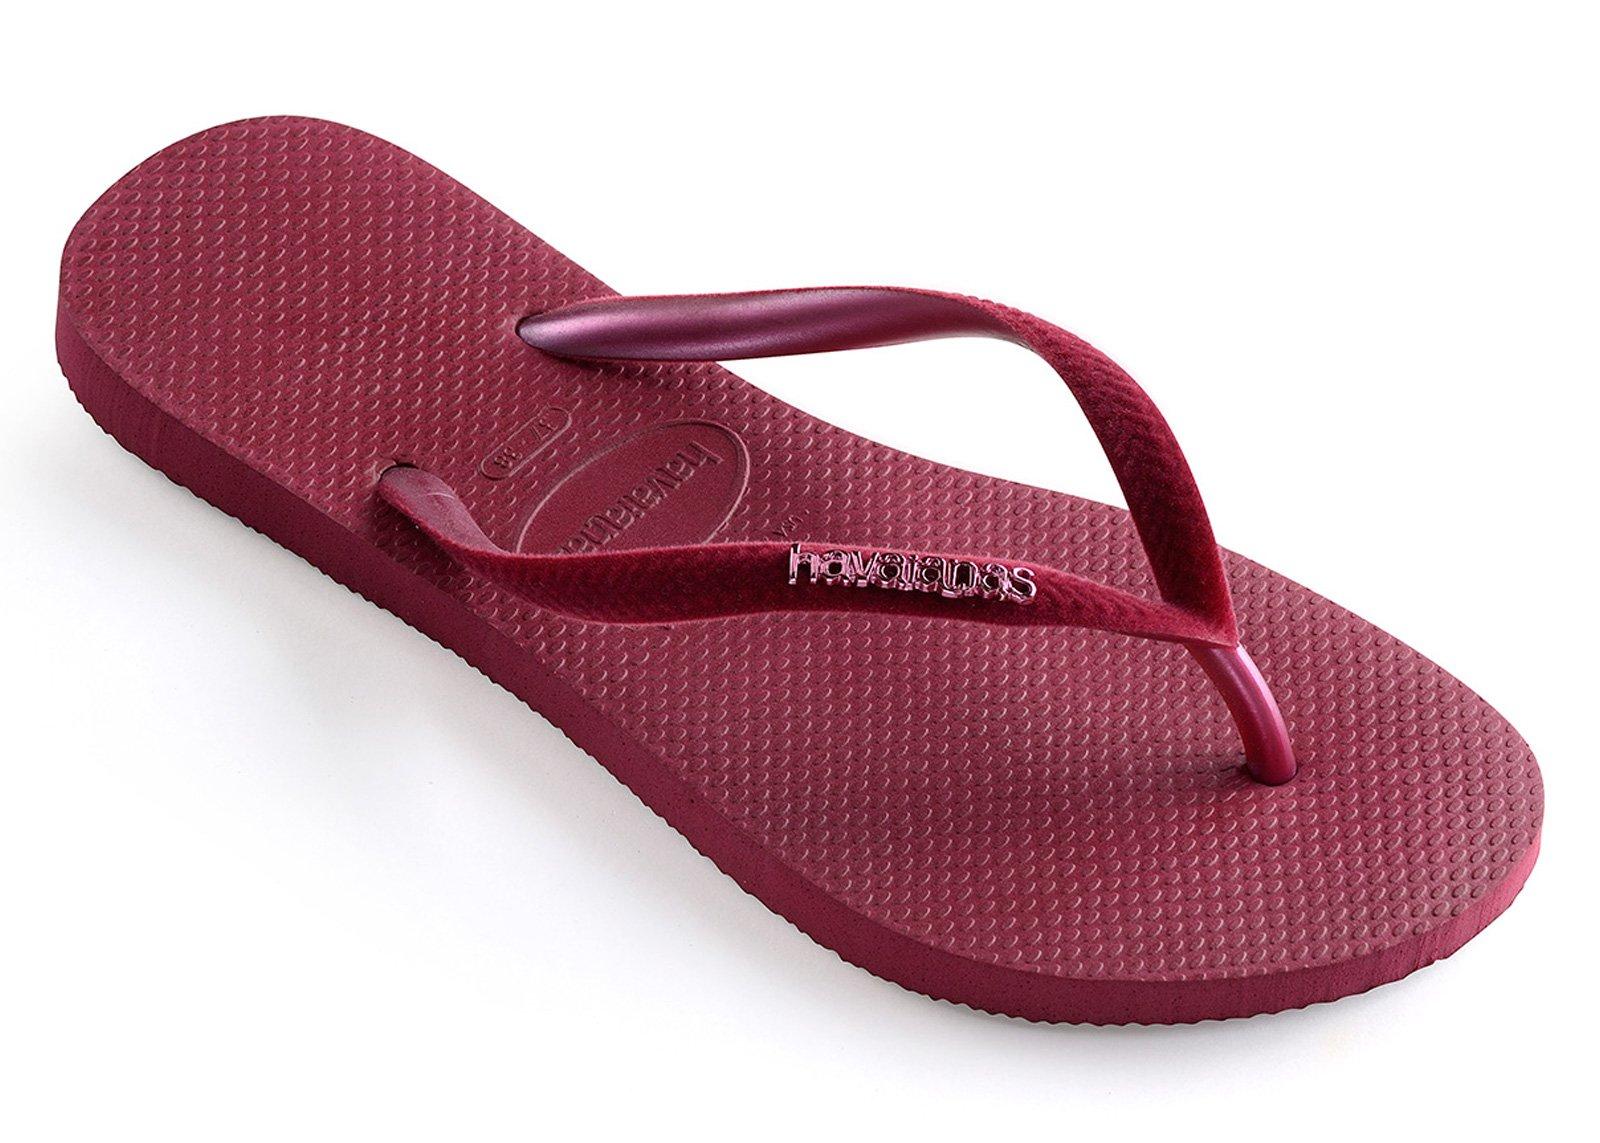 75939cd53 Flip-Flops Slim Velvet Beet - Brand Havaianas